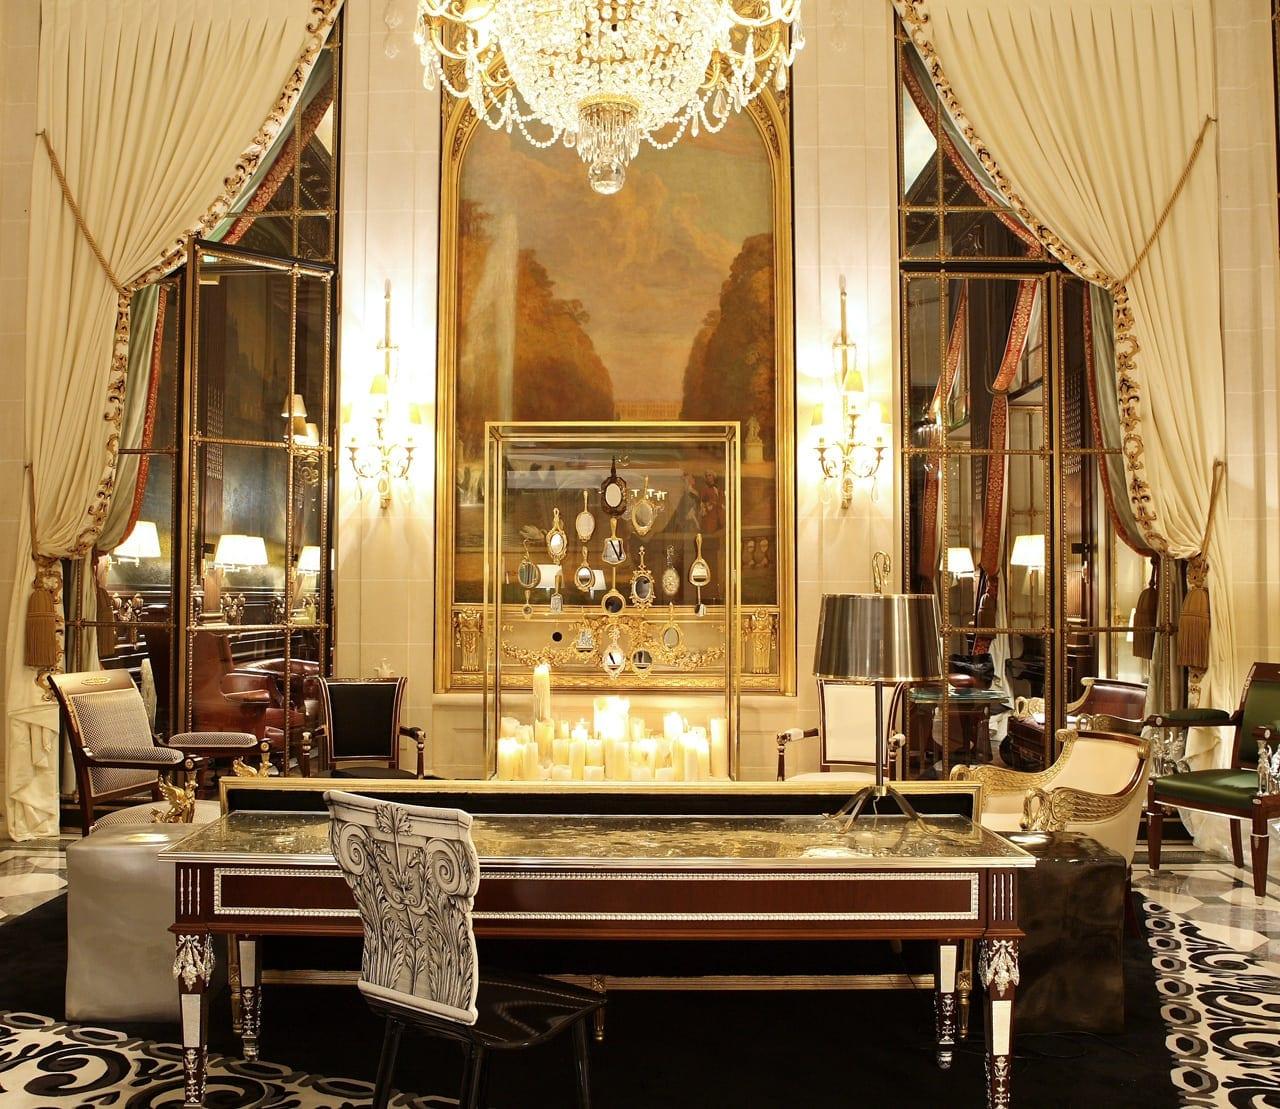 H6380 27275589 5 Lobby - Le Meurice, Paris - Romantism, opulență și lux